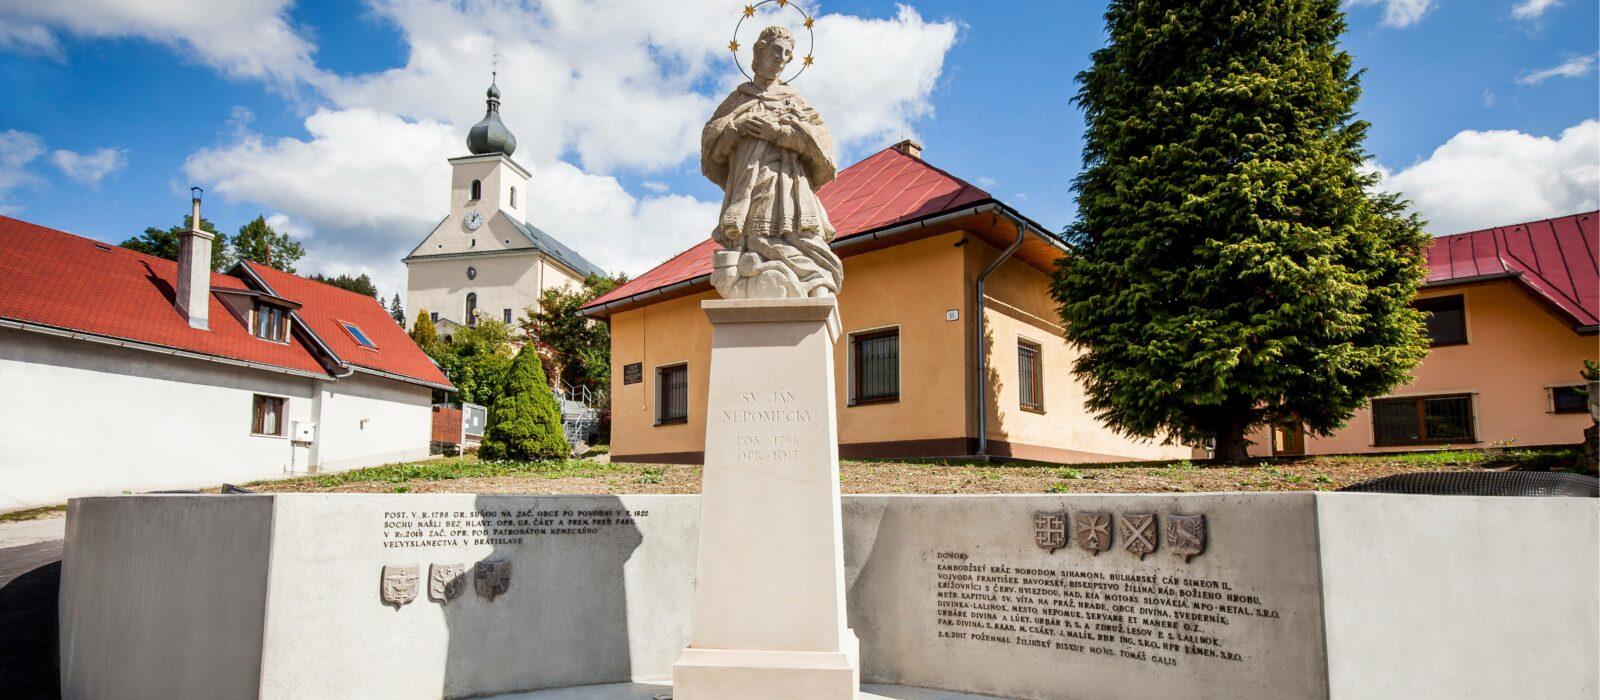 Statue of St. John of Nepomuk in Divina_Servare et Manere_Marek Sobola